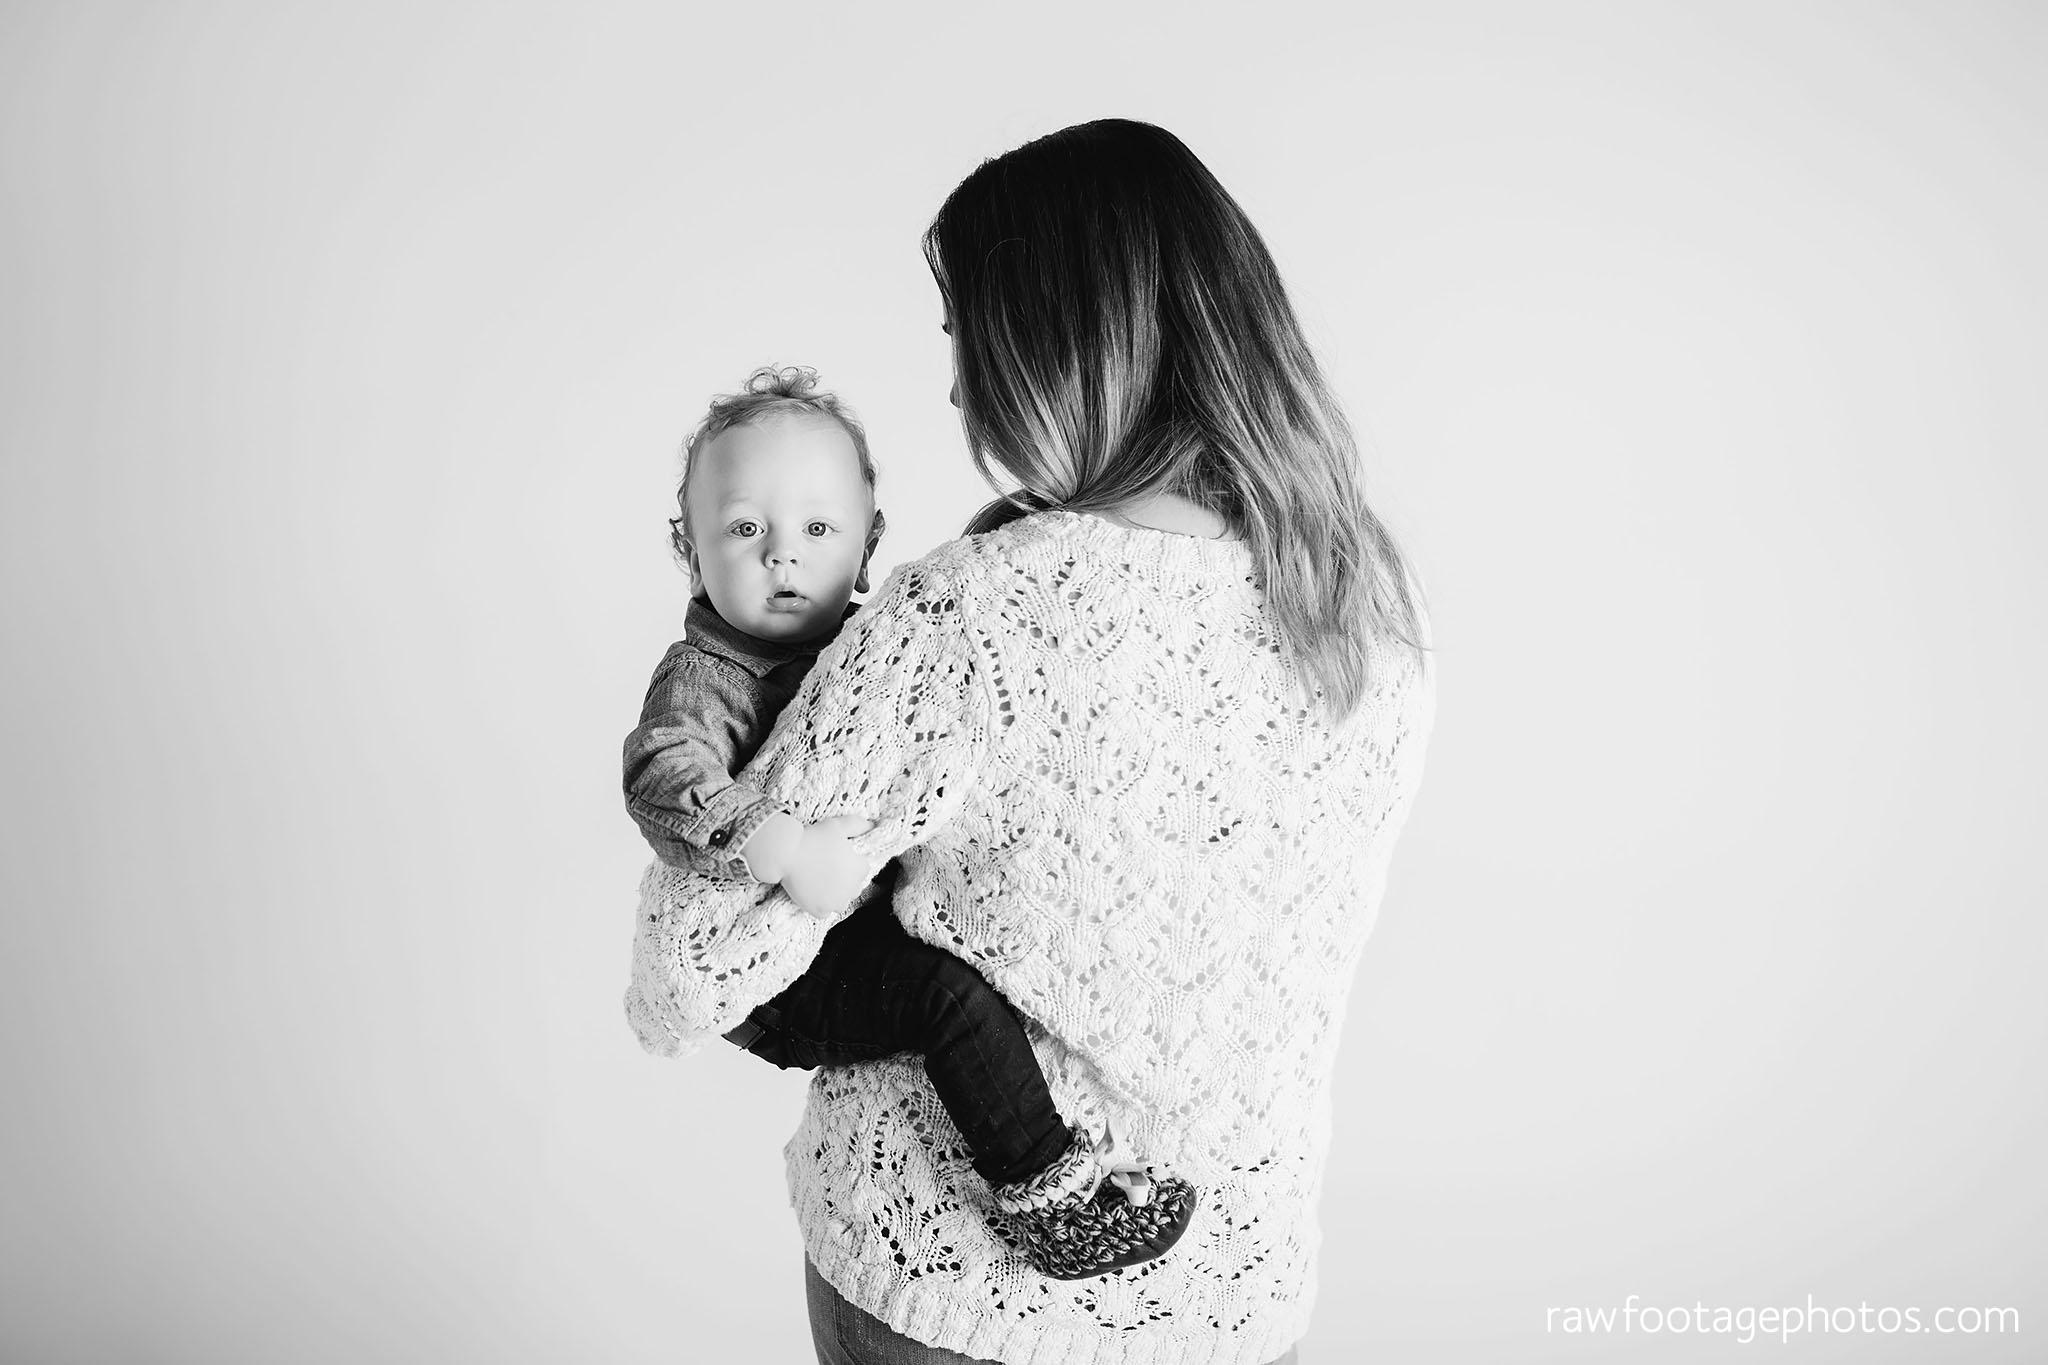 london_ontario_family_photographer-studio_photography-studio_lifestyle_portraits-white_studio-mother_son-candid_family_photography-raw_footage_photography002.jpg